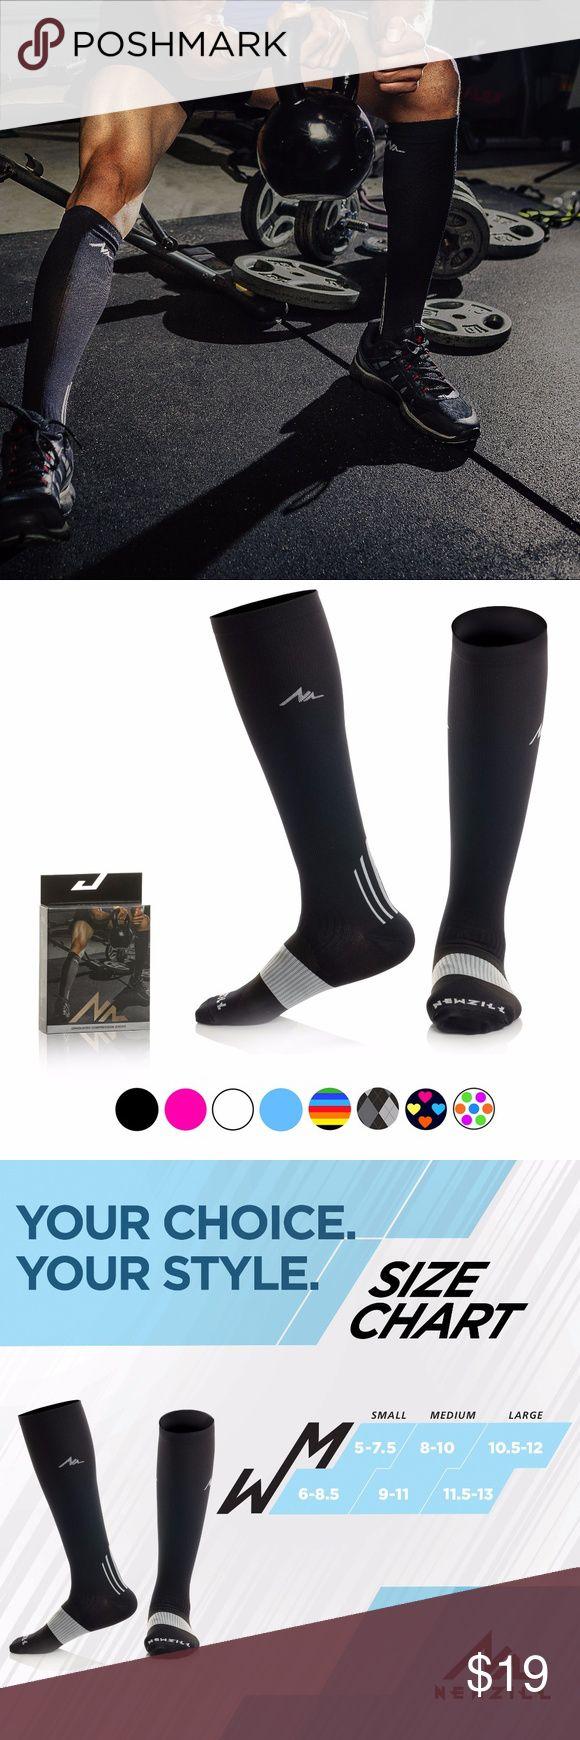 24-SEVEN BLACK NEWZILL Compression Socks (1 pair), Men & Women Running Socks - BEST Graduated Athletic Fit for Sports, Nurses, Shin Splints, Maternity & Flight Travel NEWZILL GEAR Underwear & Socks Athletic Socks